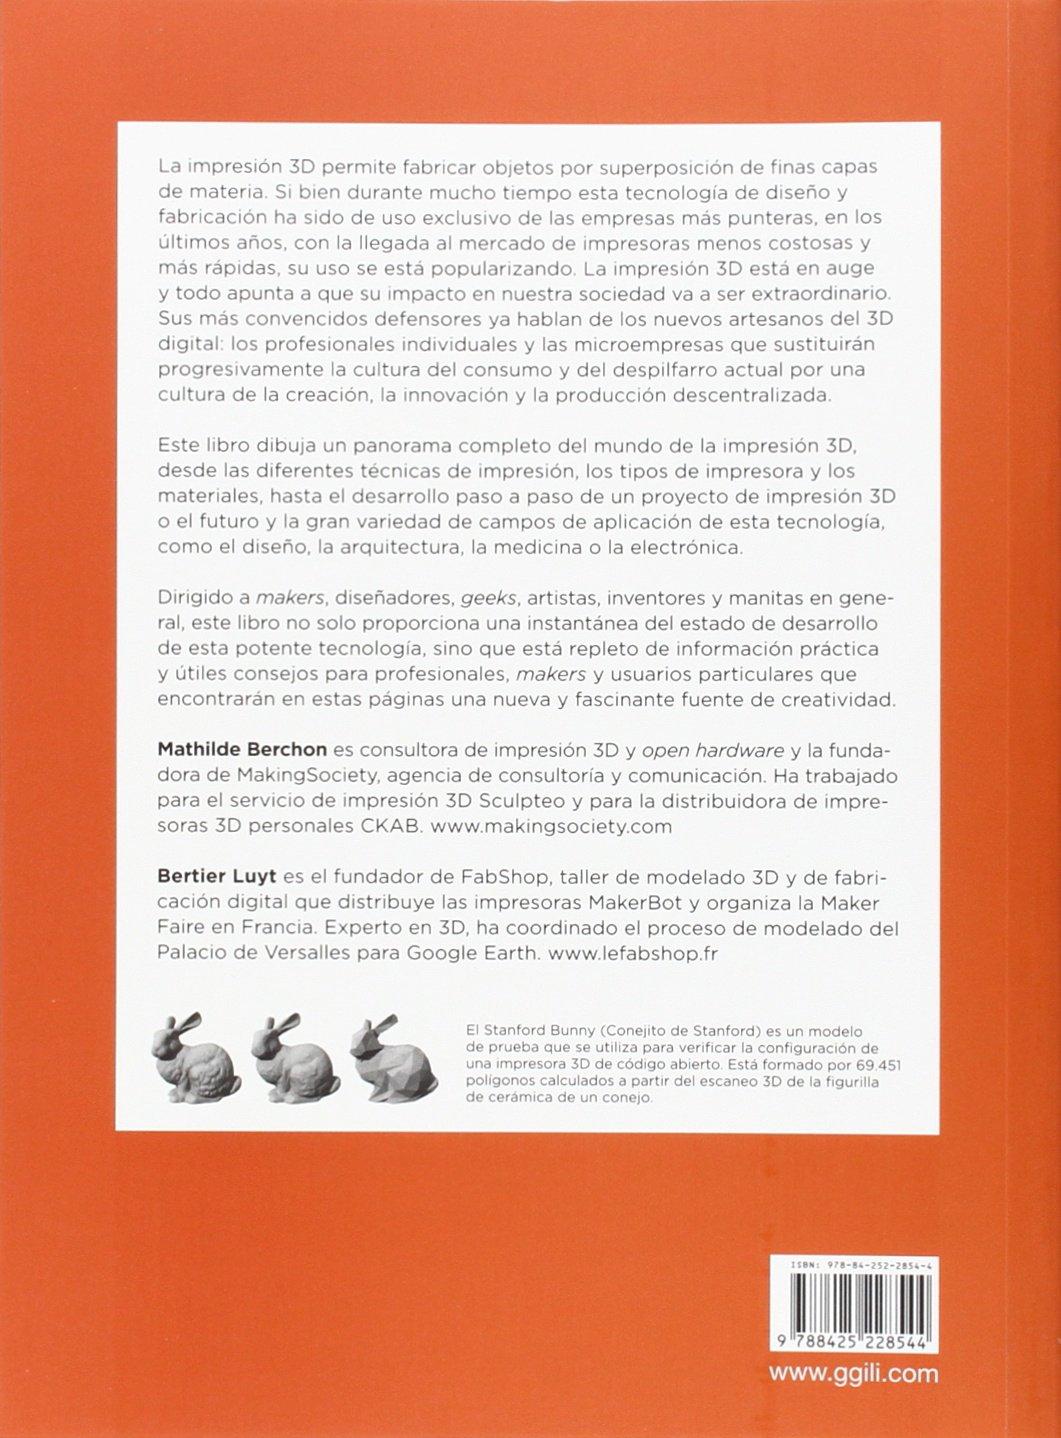 La impresión 3D: Amazon.es: Berchon, Mathilde, Luyt, Bertier ...